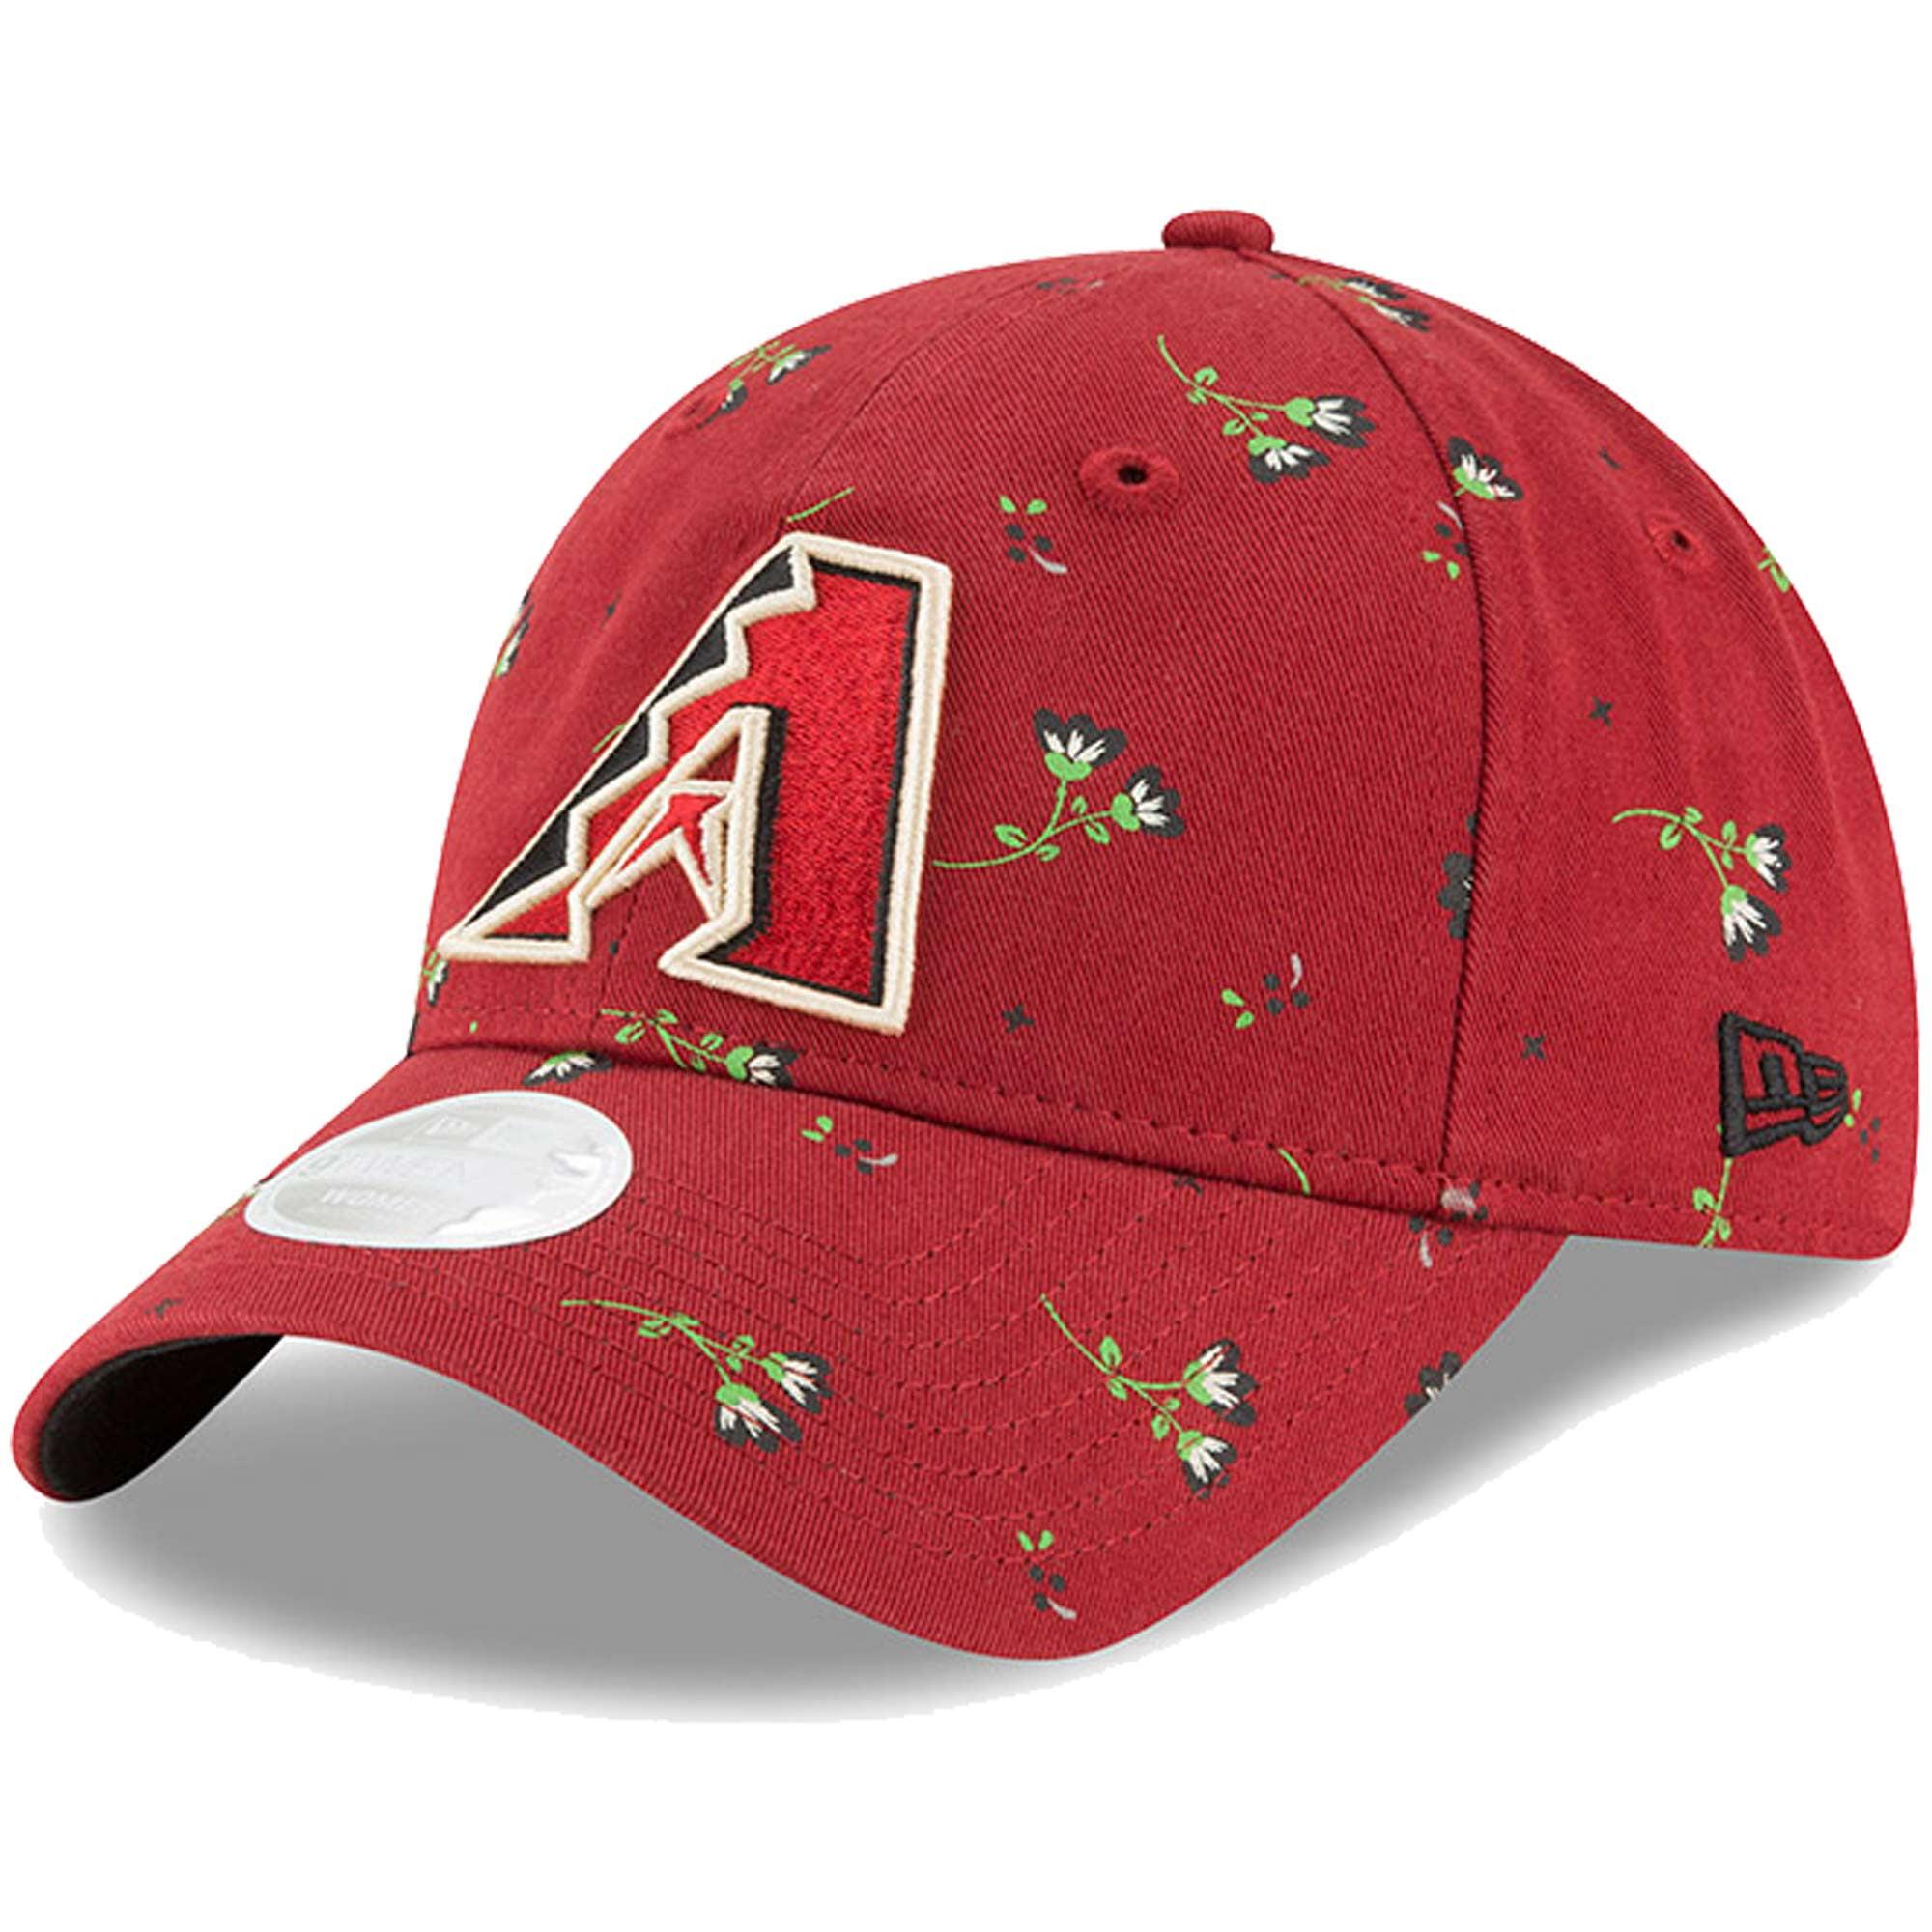 Arizona Diamondbacks New Era Women's Blossom 9TWENTY Adjustable Hat - Black - OSFA